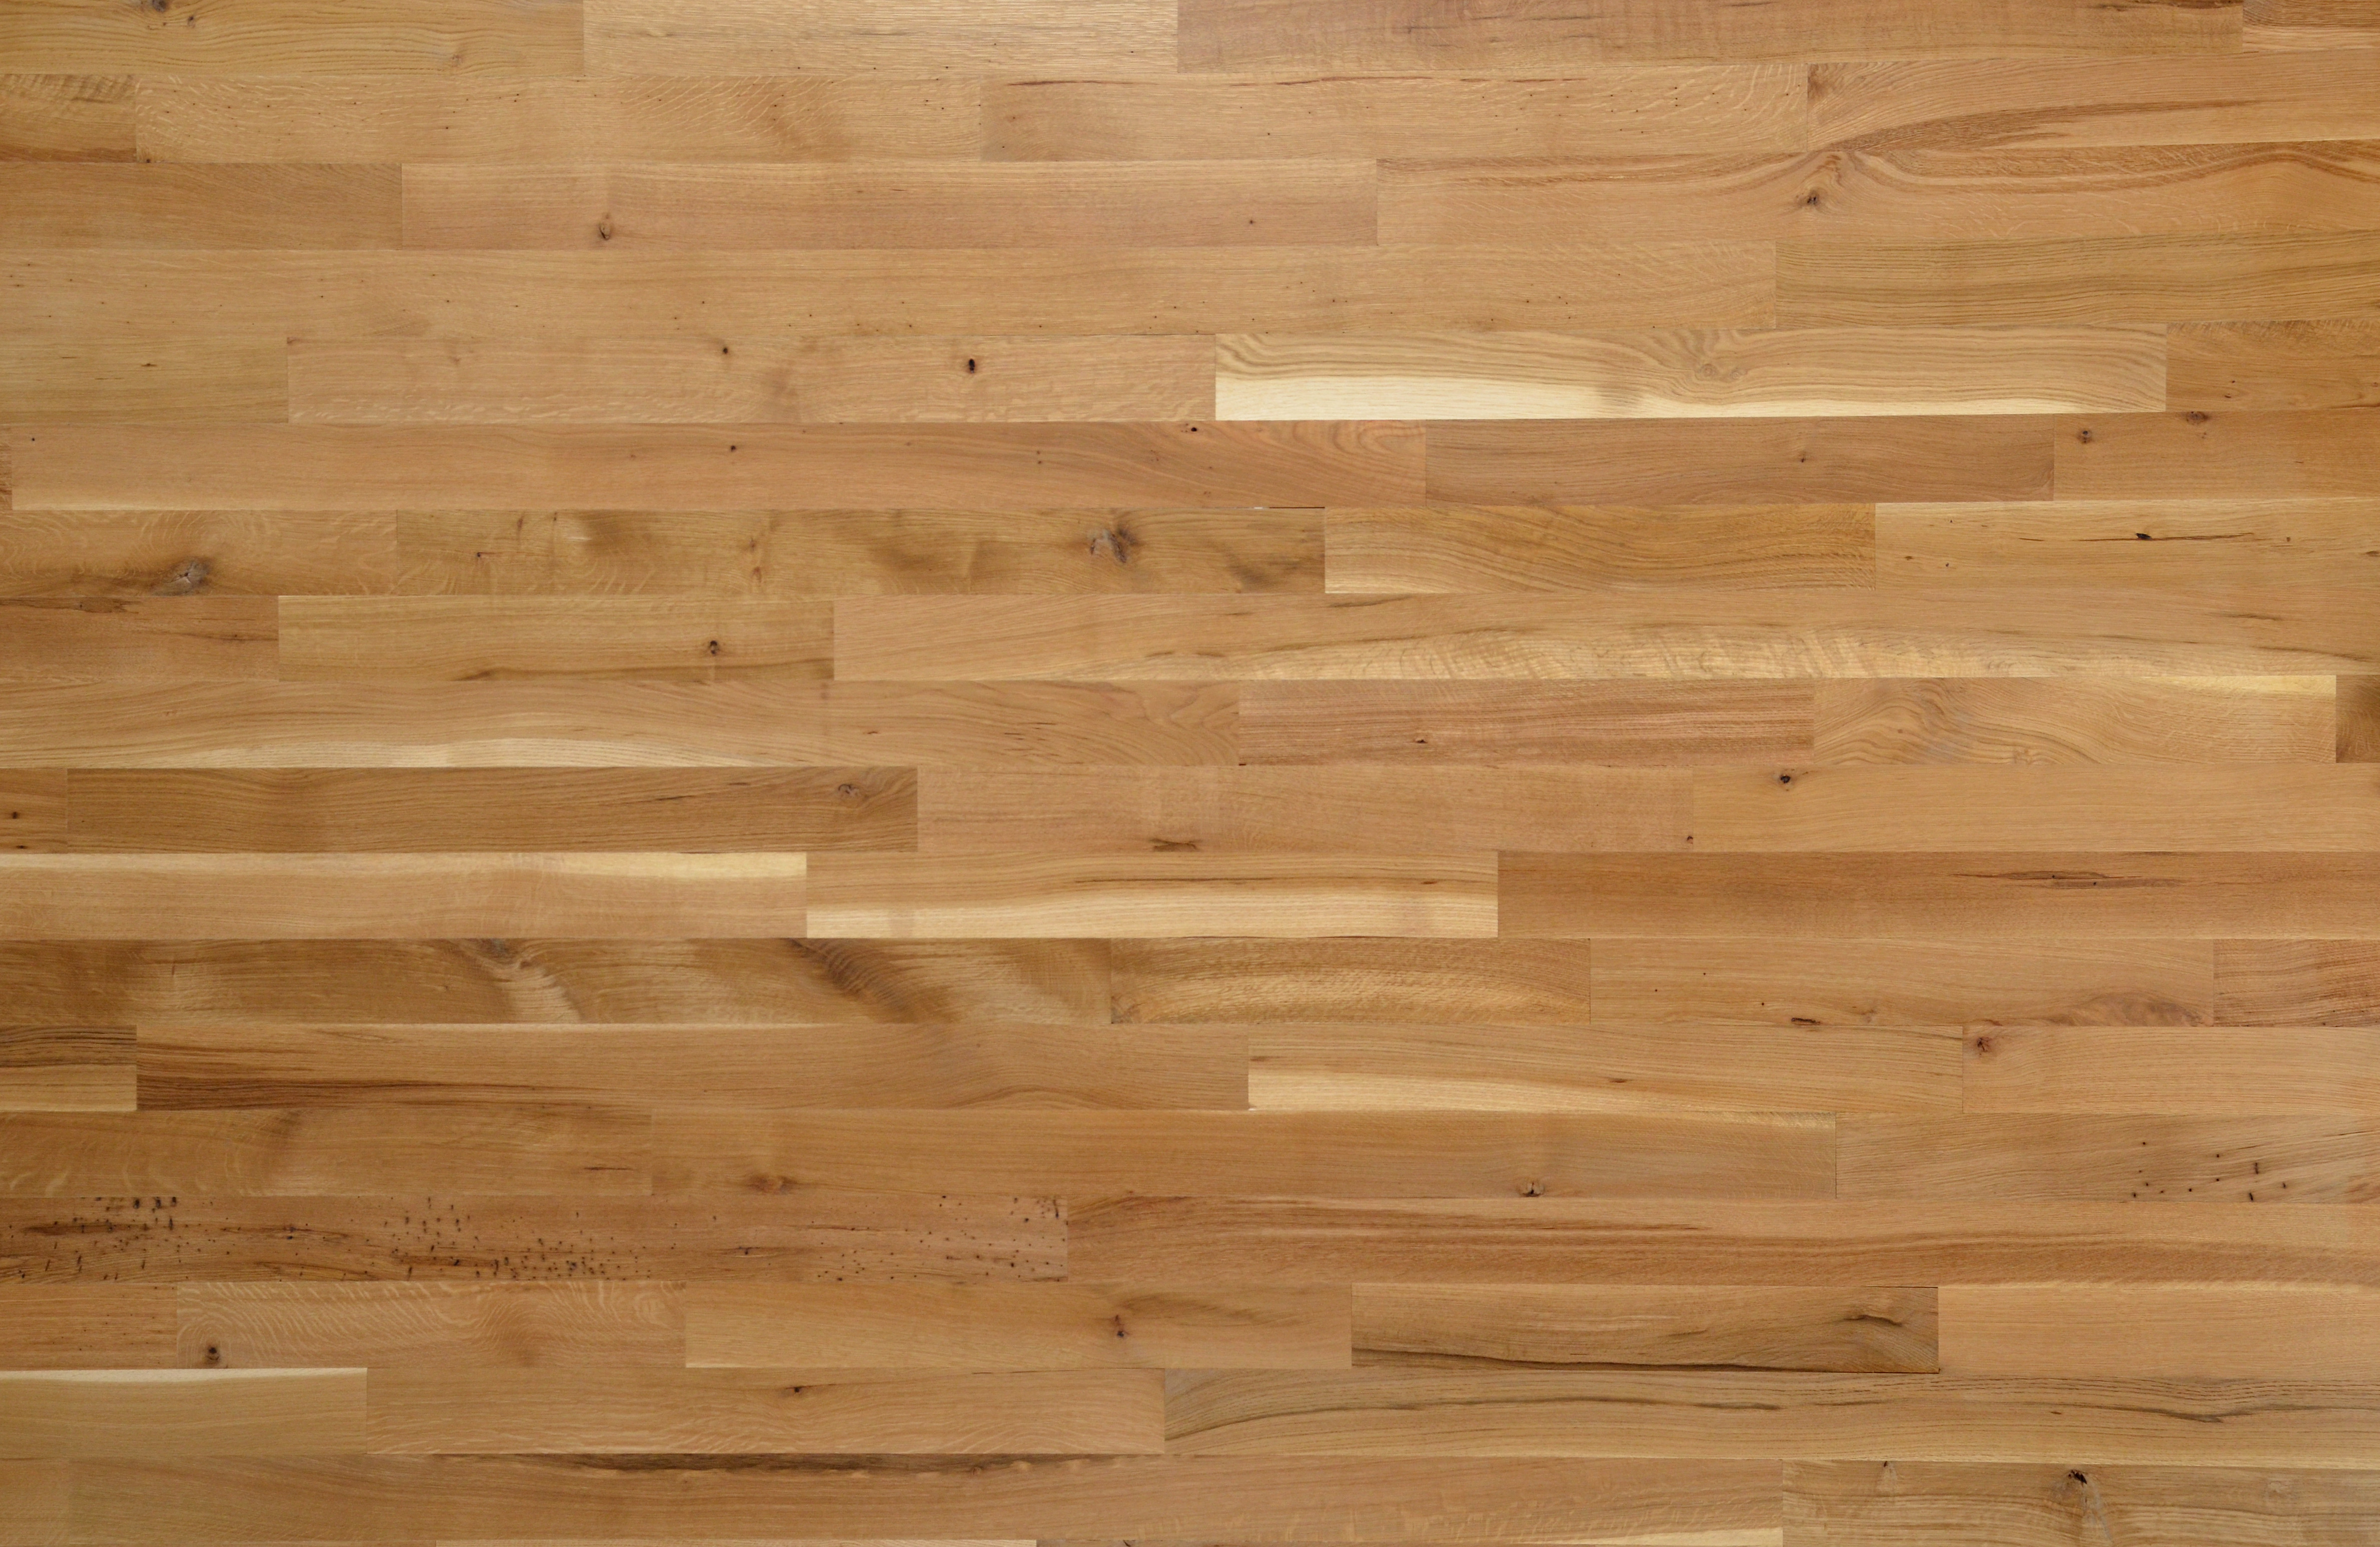 hardwood floor installation phoenix of lacrosse hardwood flooring walnut white oak red oak hickory with regard to rift quartered natural white oak